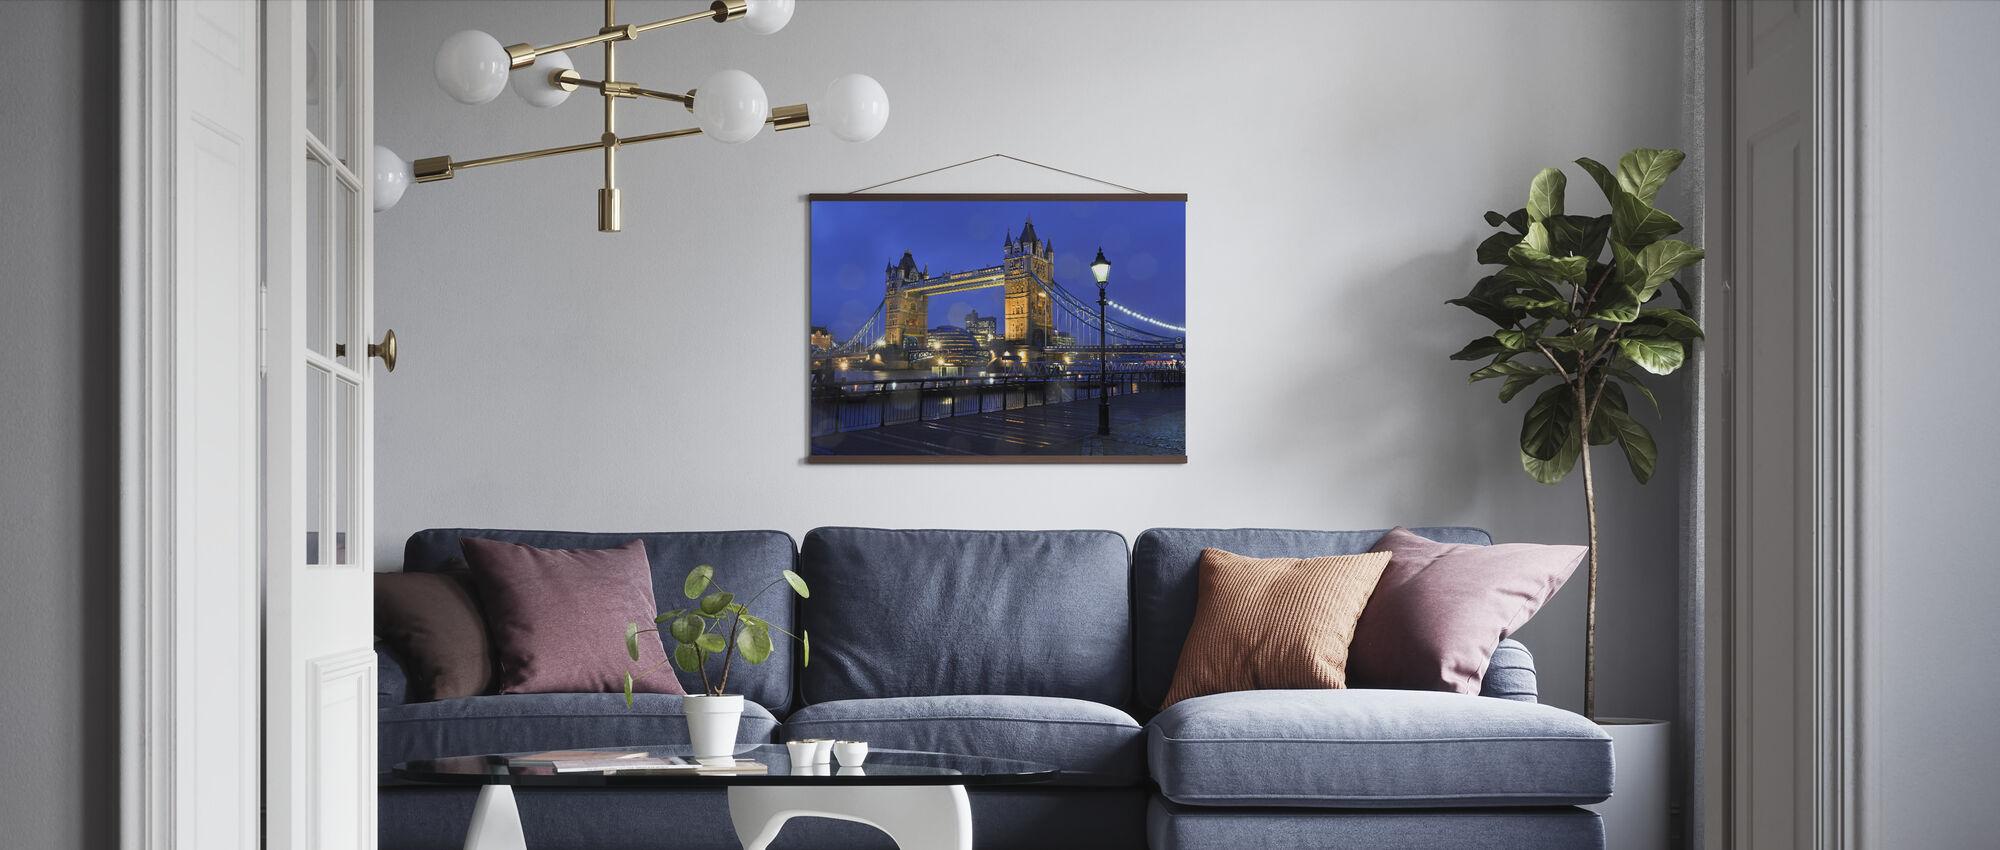 Tower Bridge Lontoo - Juliste - Olohuone